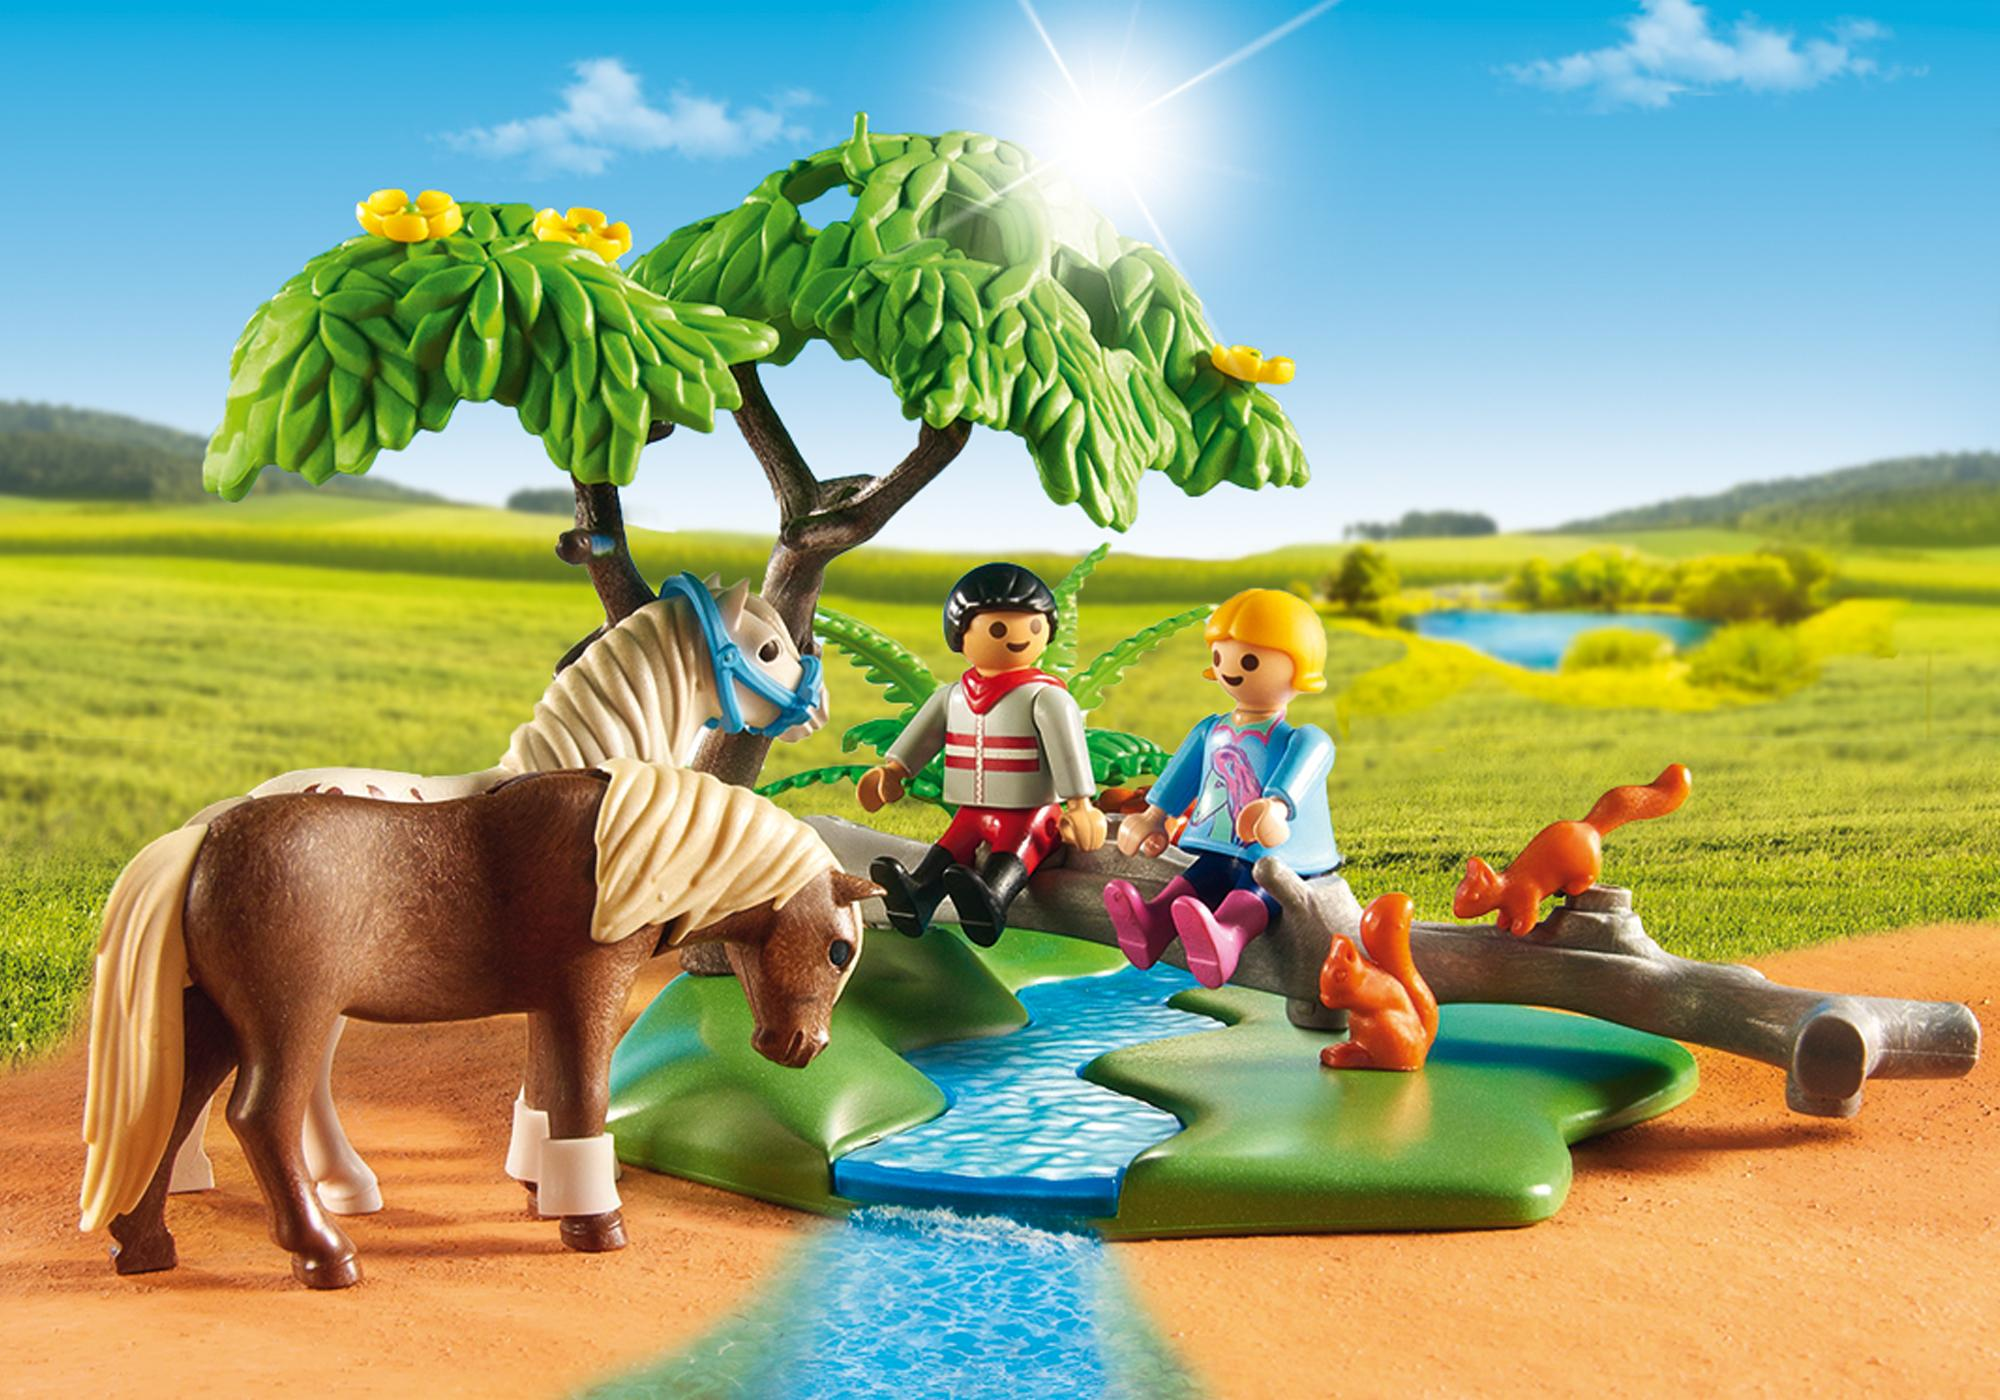 http://media.playmobil.com/i/playmobil/5685_product_extra1/Country Horseback Ride